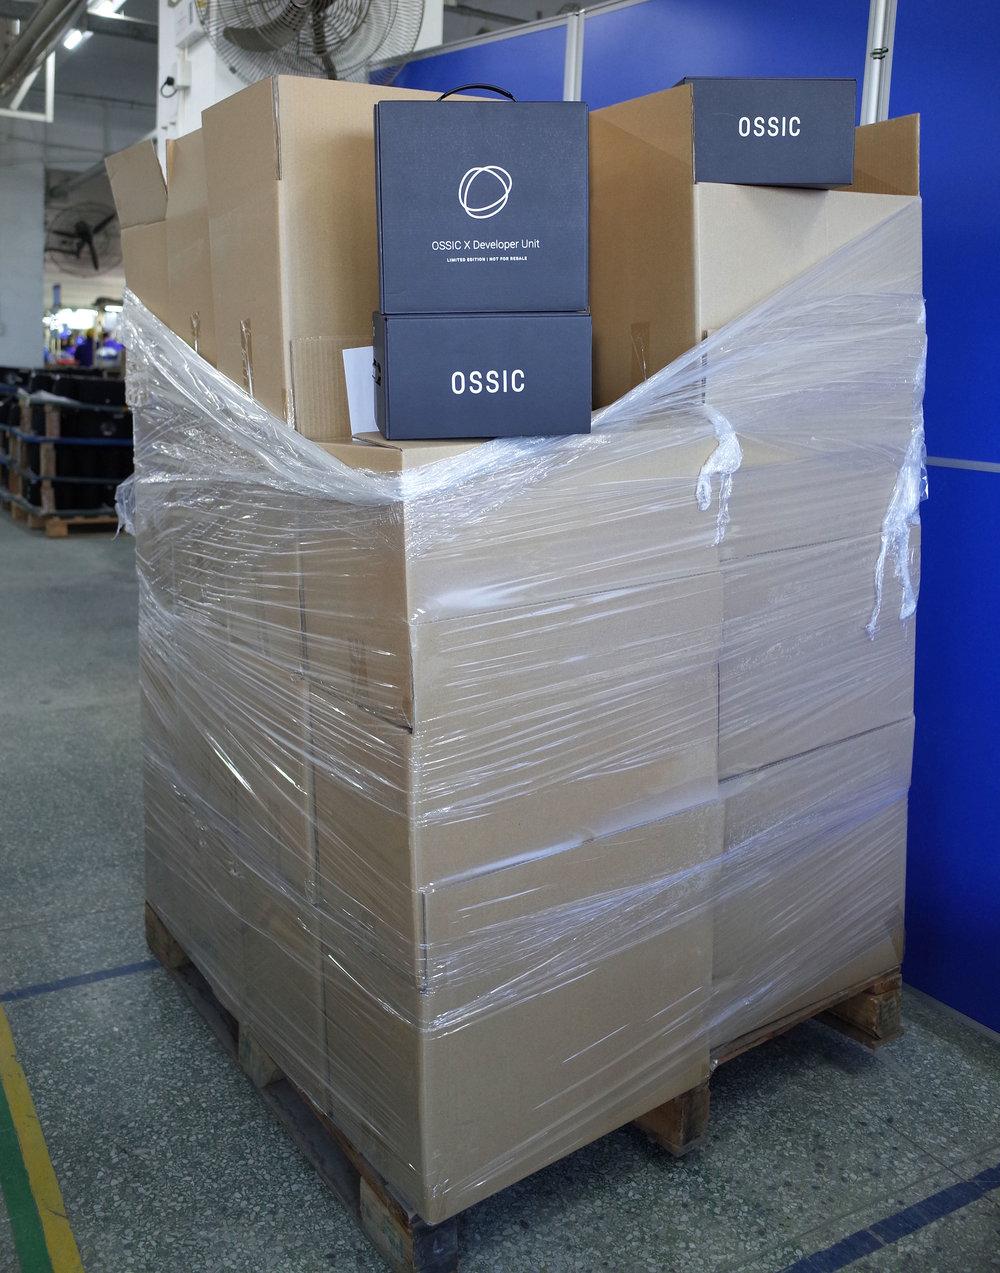 Developer Units ready for final shipment